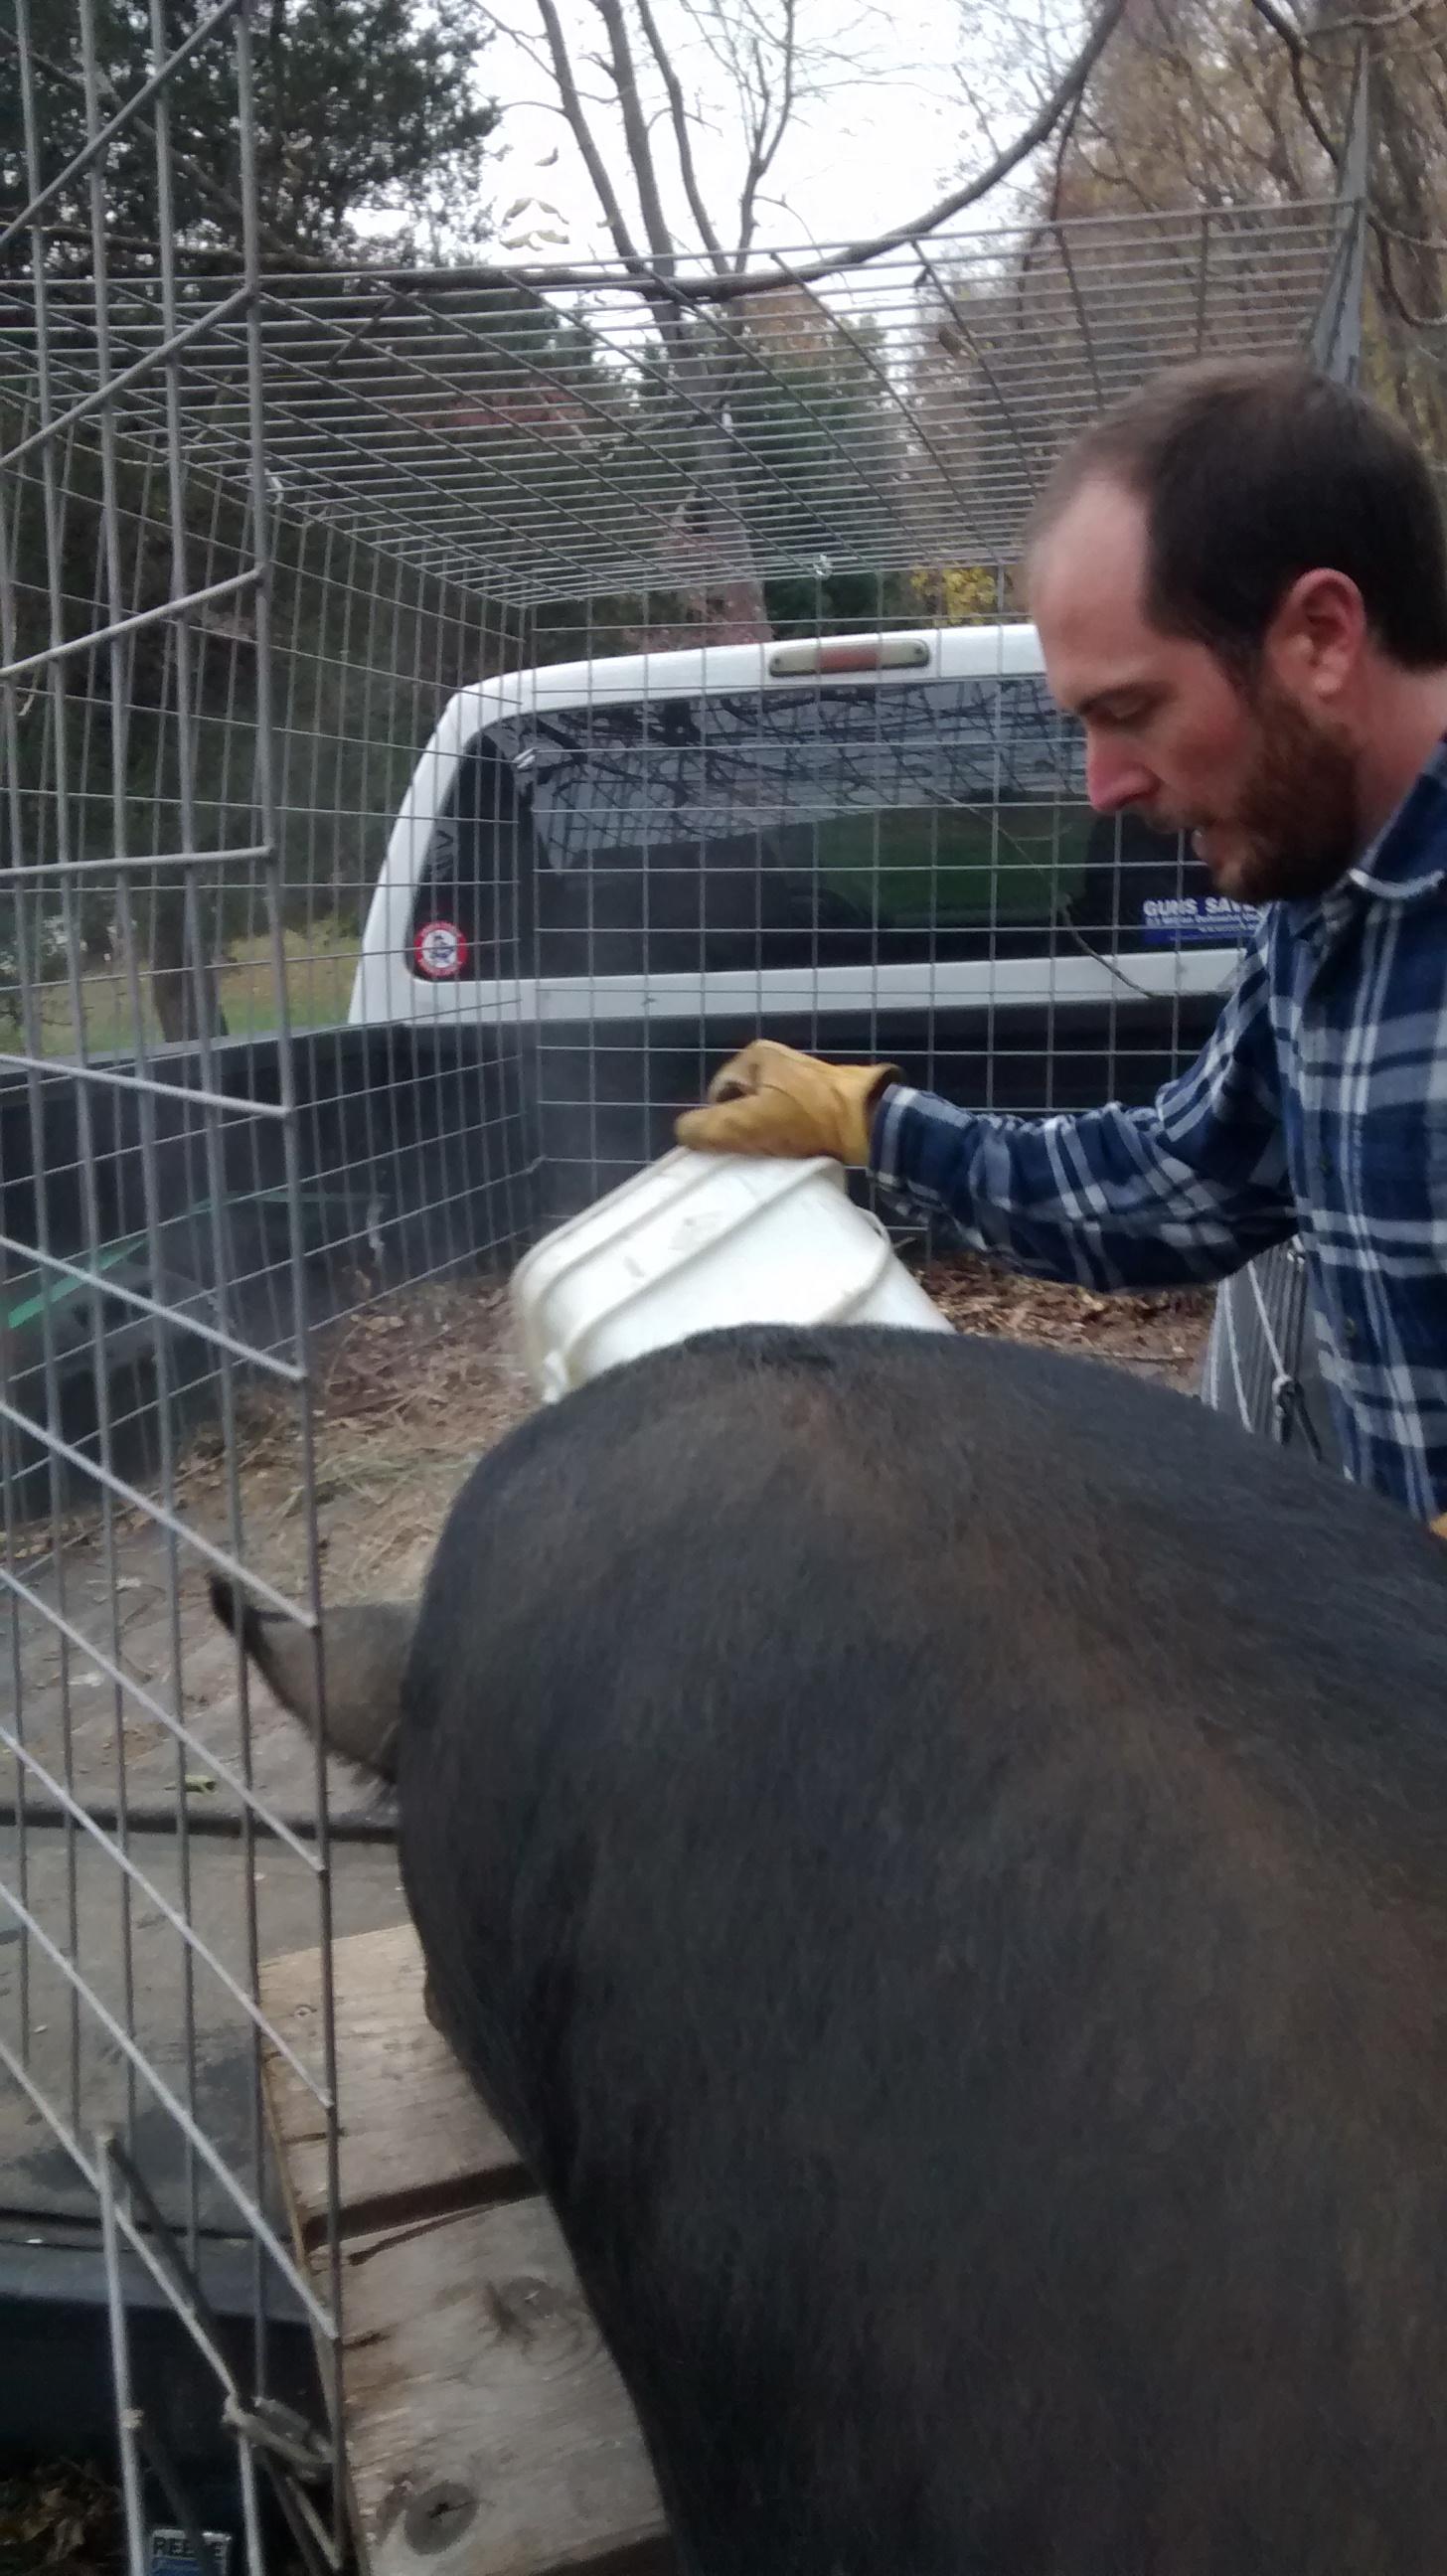 DIY Truck Bed Livestock Carrier | Independence Homestead